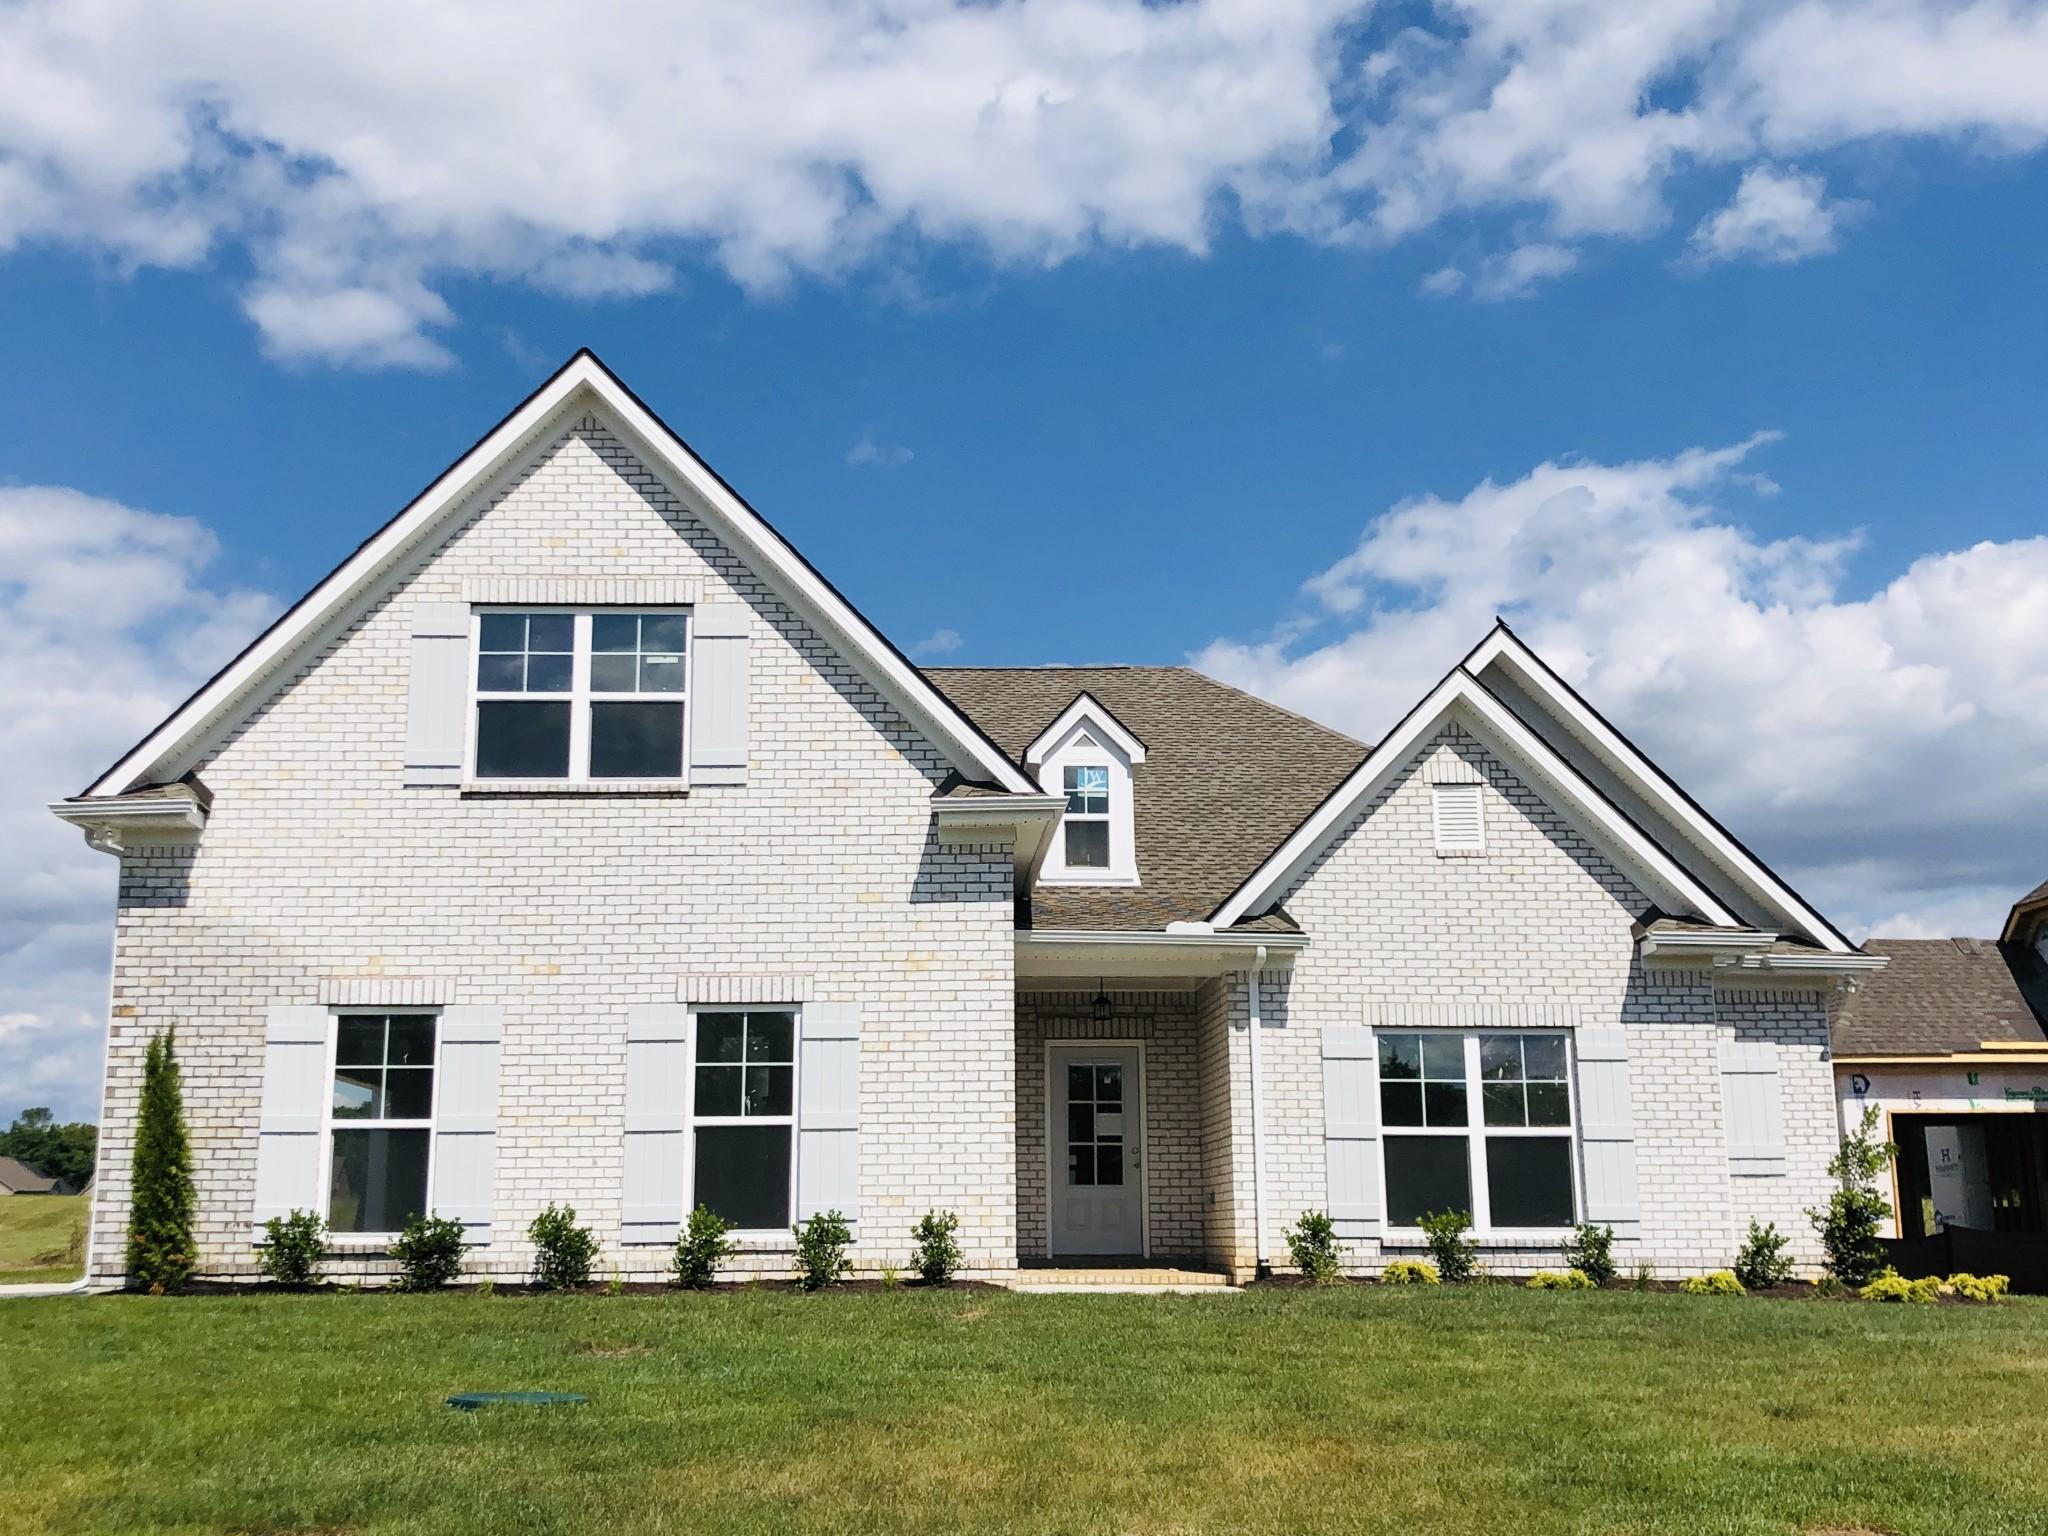 1122 Kittywood Court #185, Murfreesboro, TN 37128 - Murfreesboro, TN real estate listing